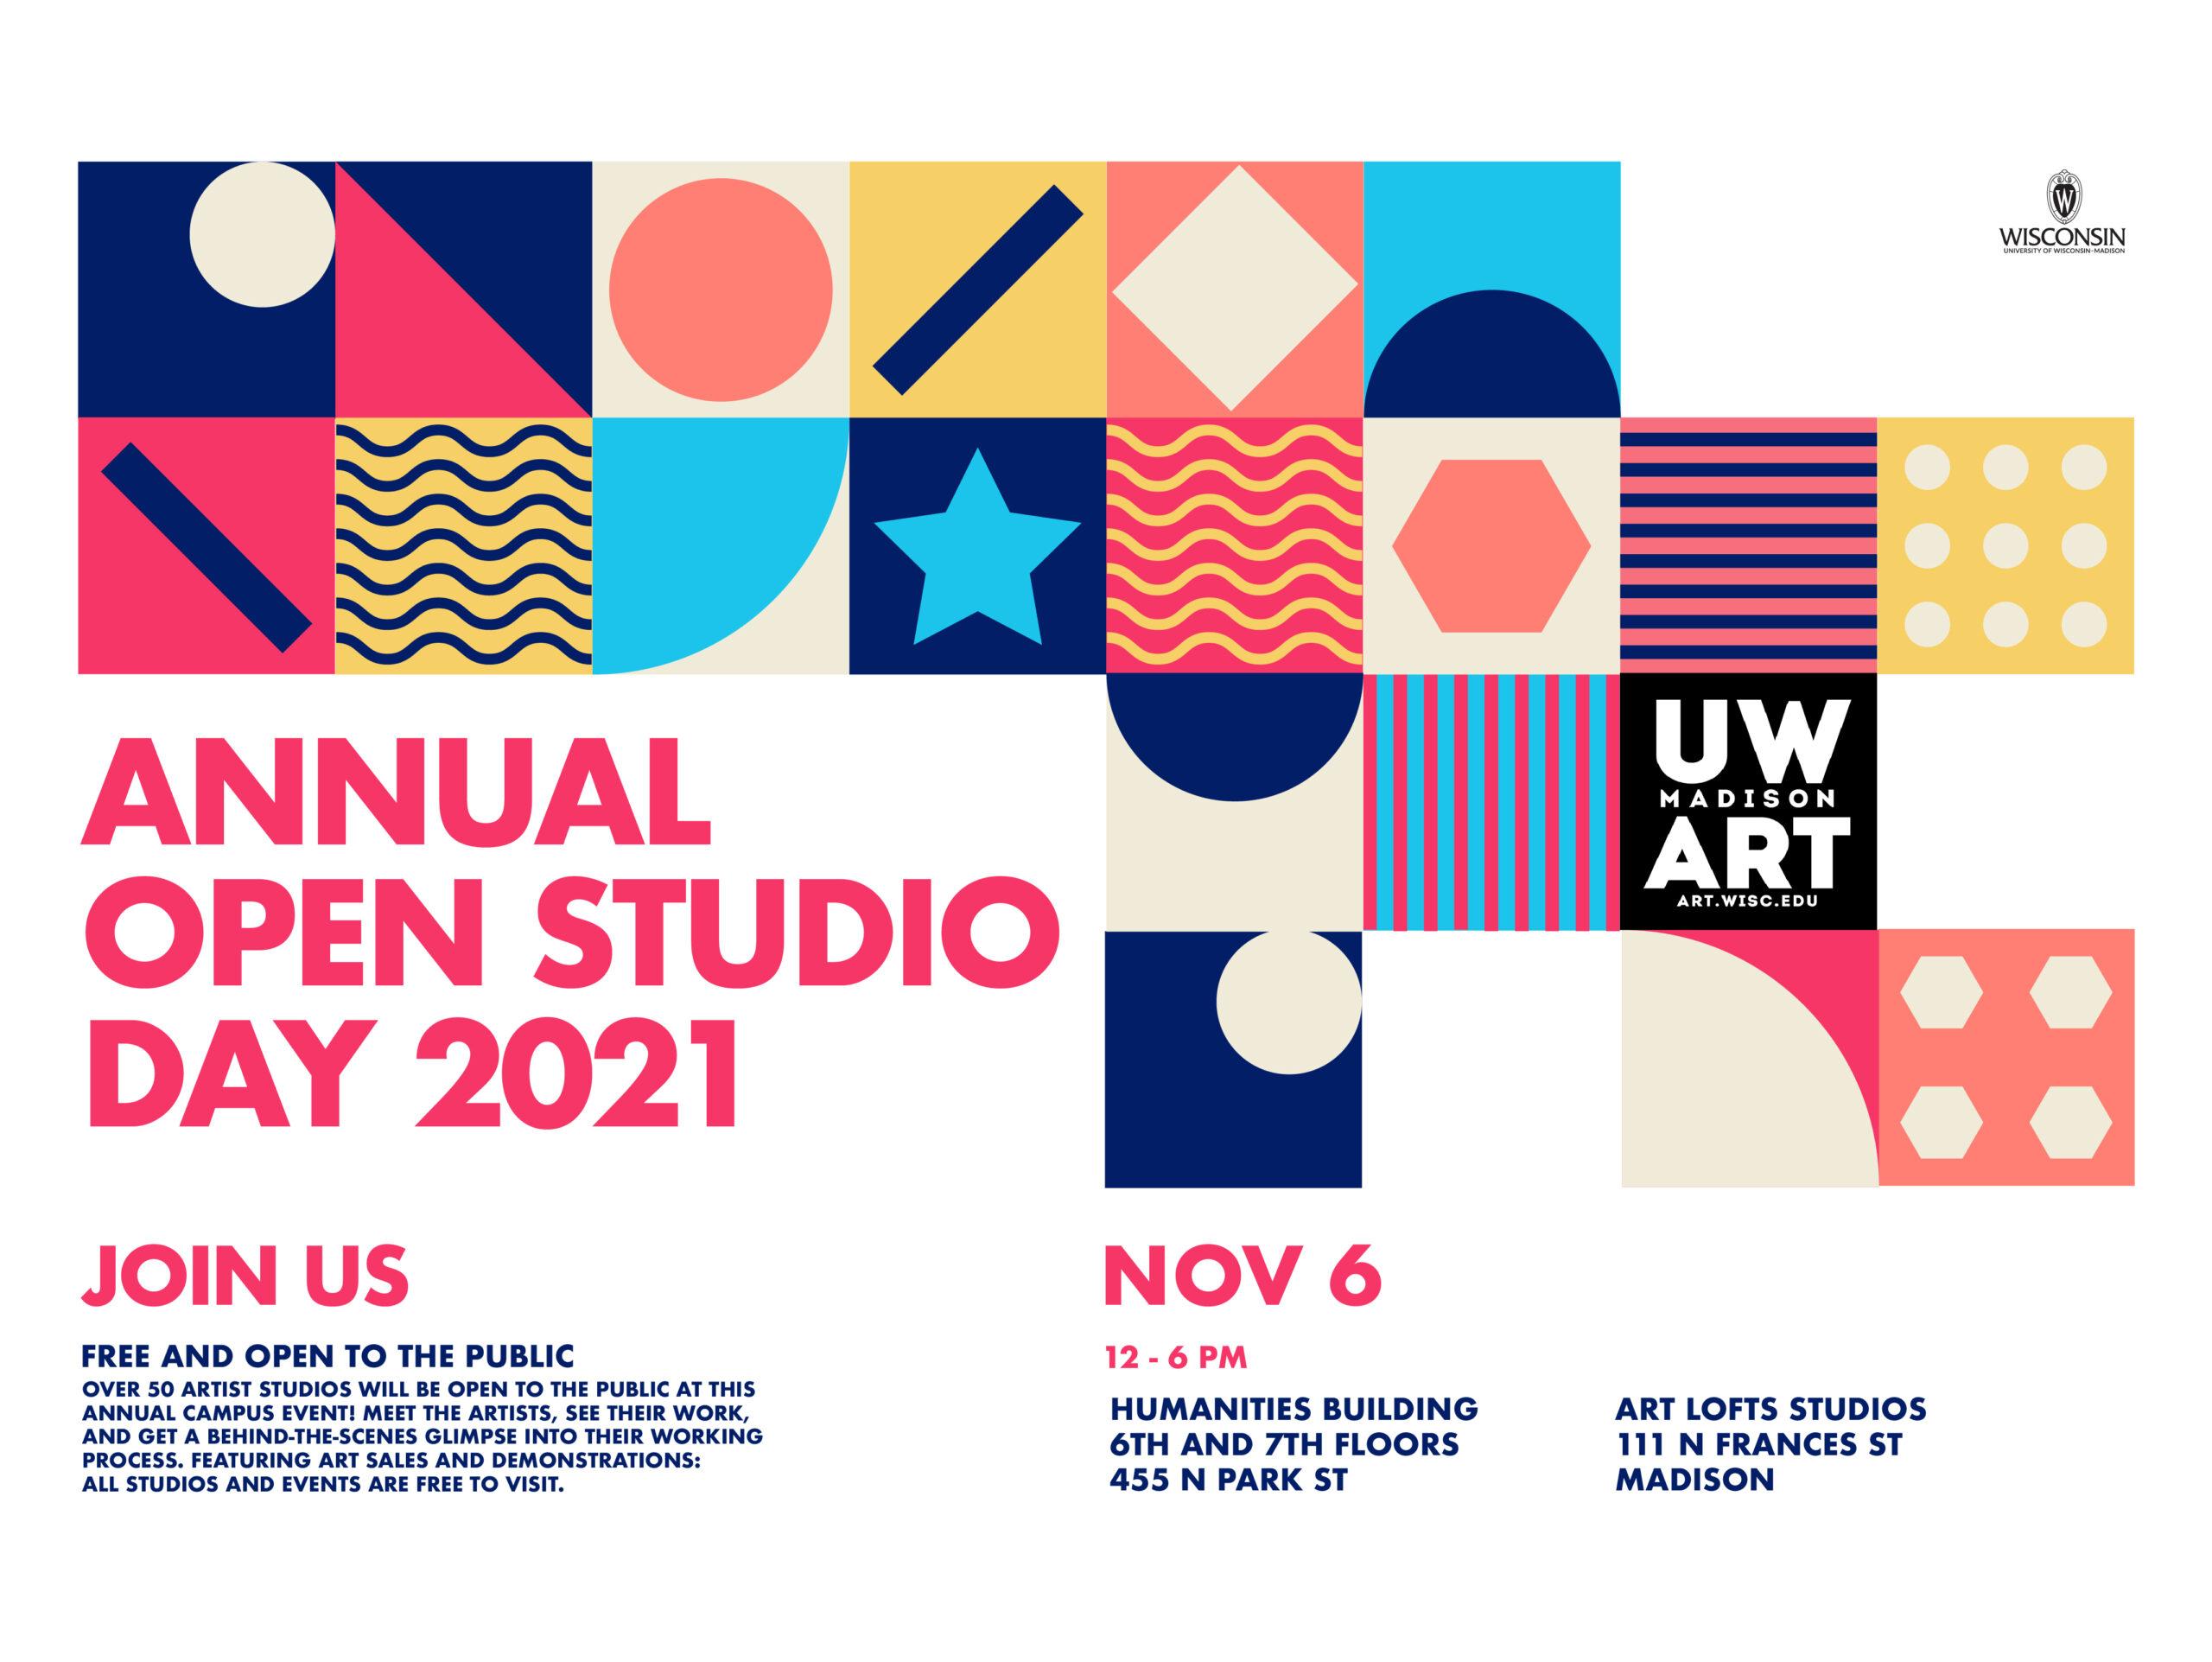 Annual Open Studio Day 2021 flyer